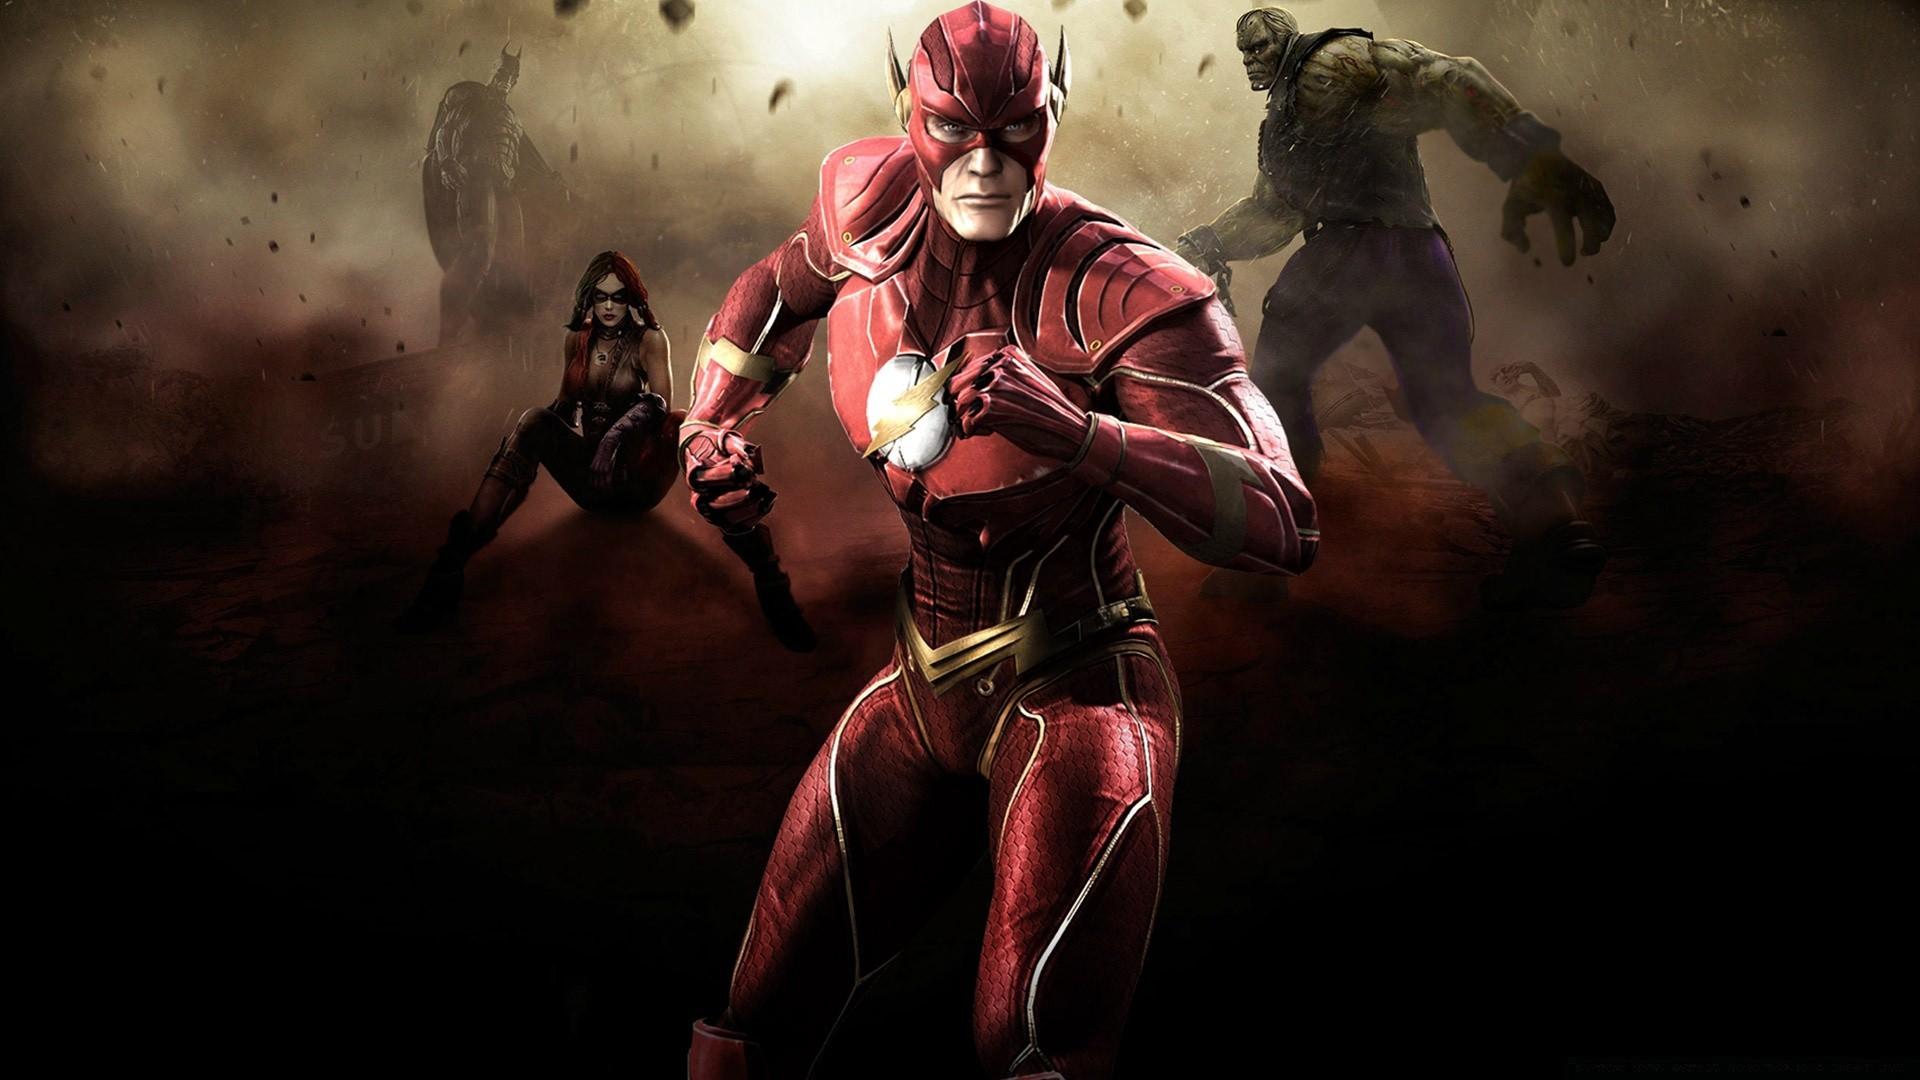 Download giochi flash